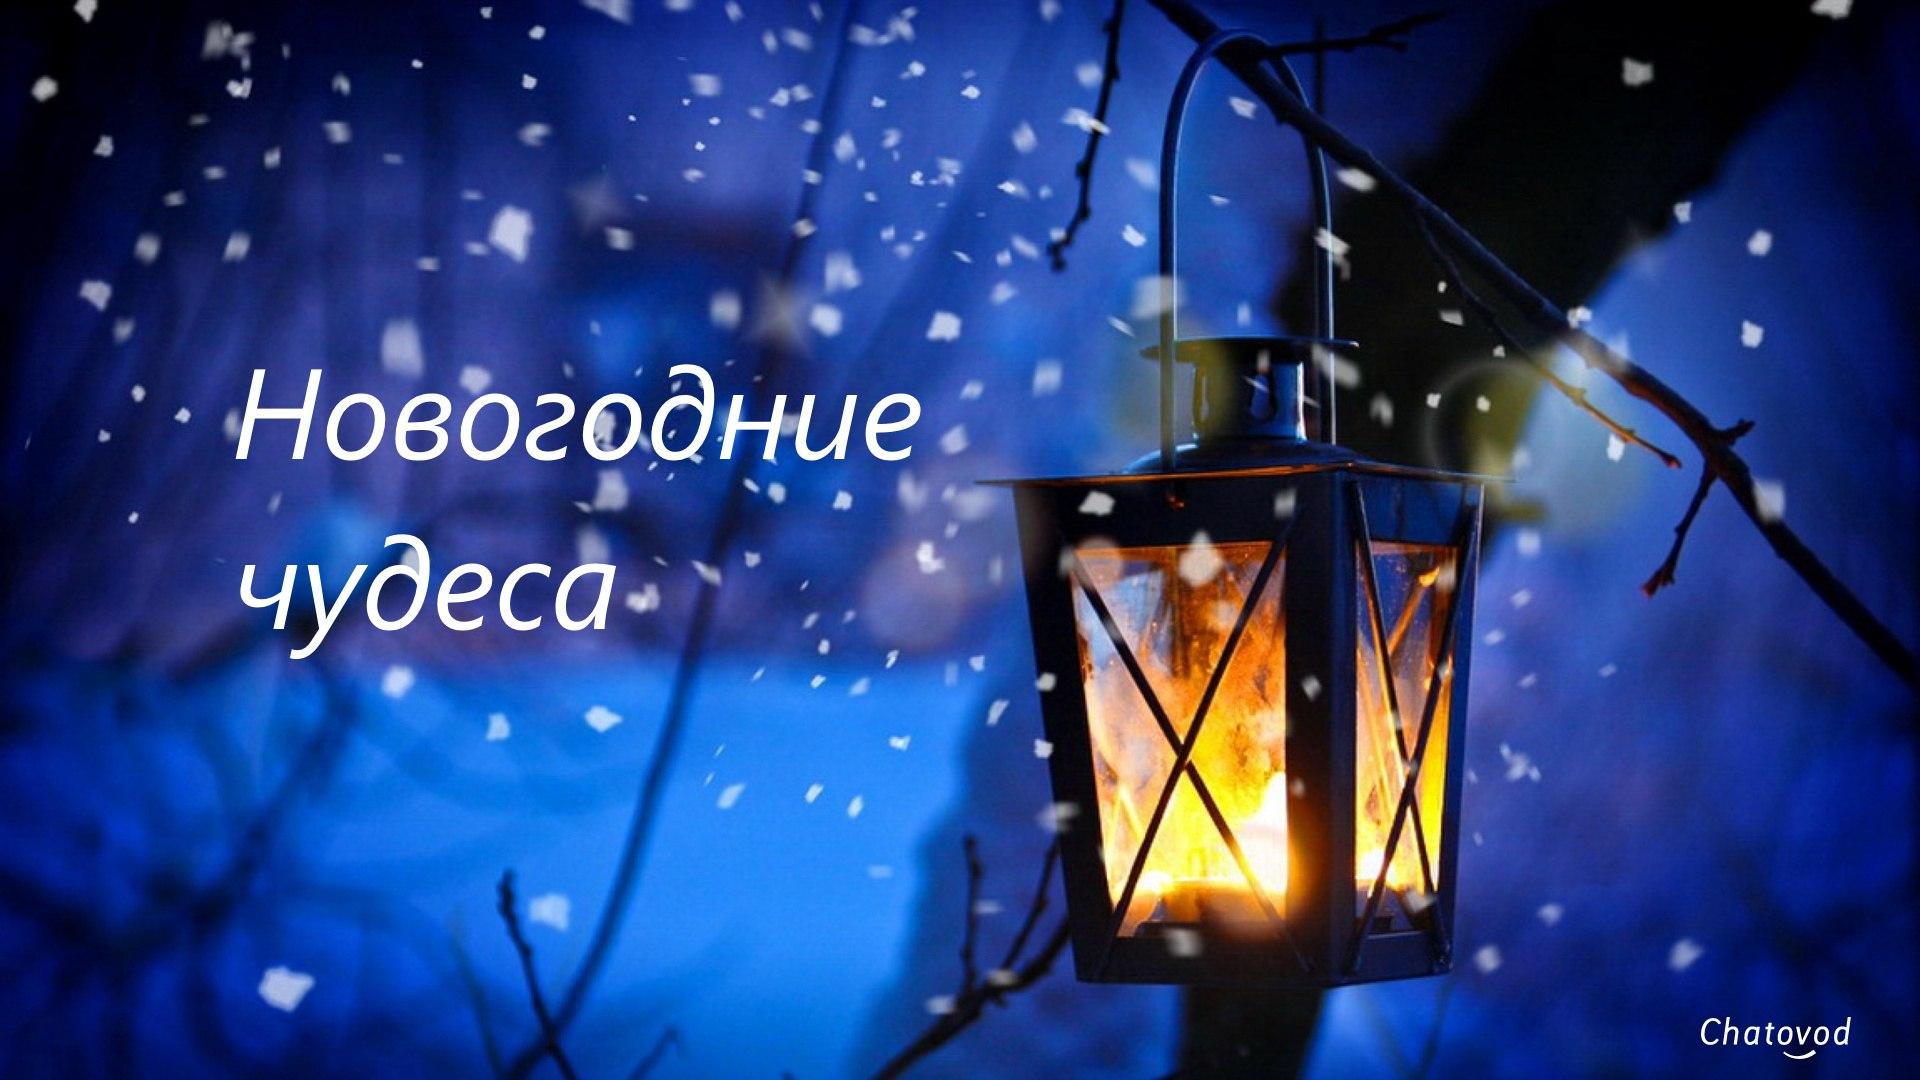 https://pp.vk.me/c630125/v630125878/30a7/udb_povMLUw.jpg